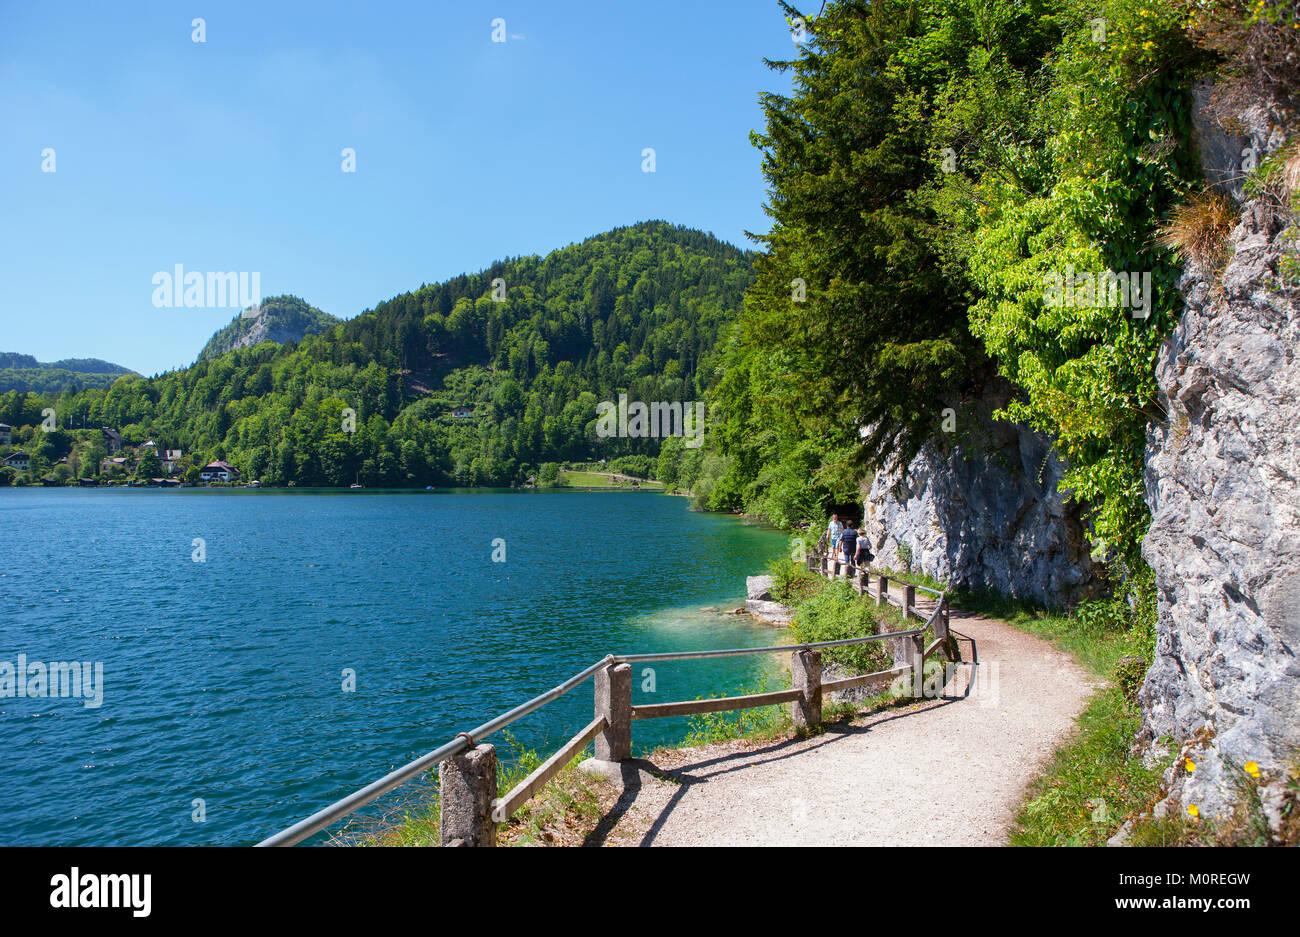 Austria, Salzkammergut, Salzburg State, Sankt Gilgen, Wolfgangsee, waterfront promenade - Stock Image